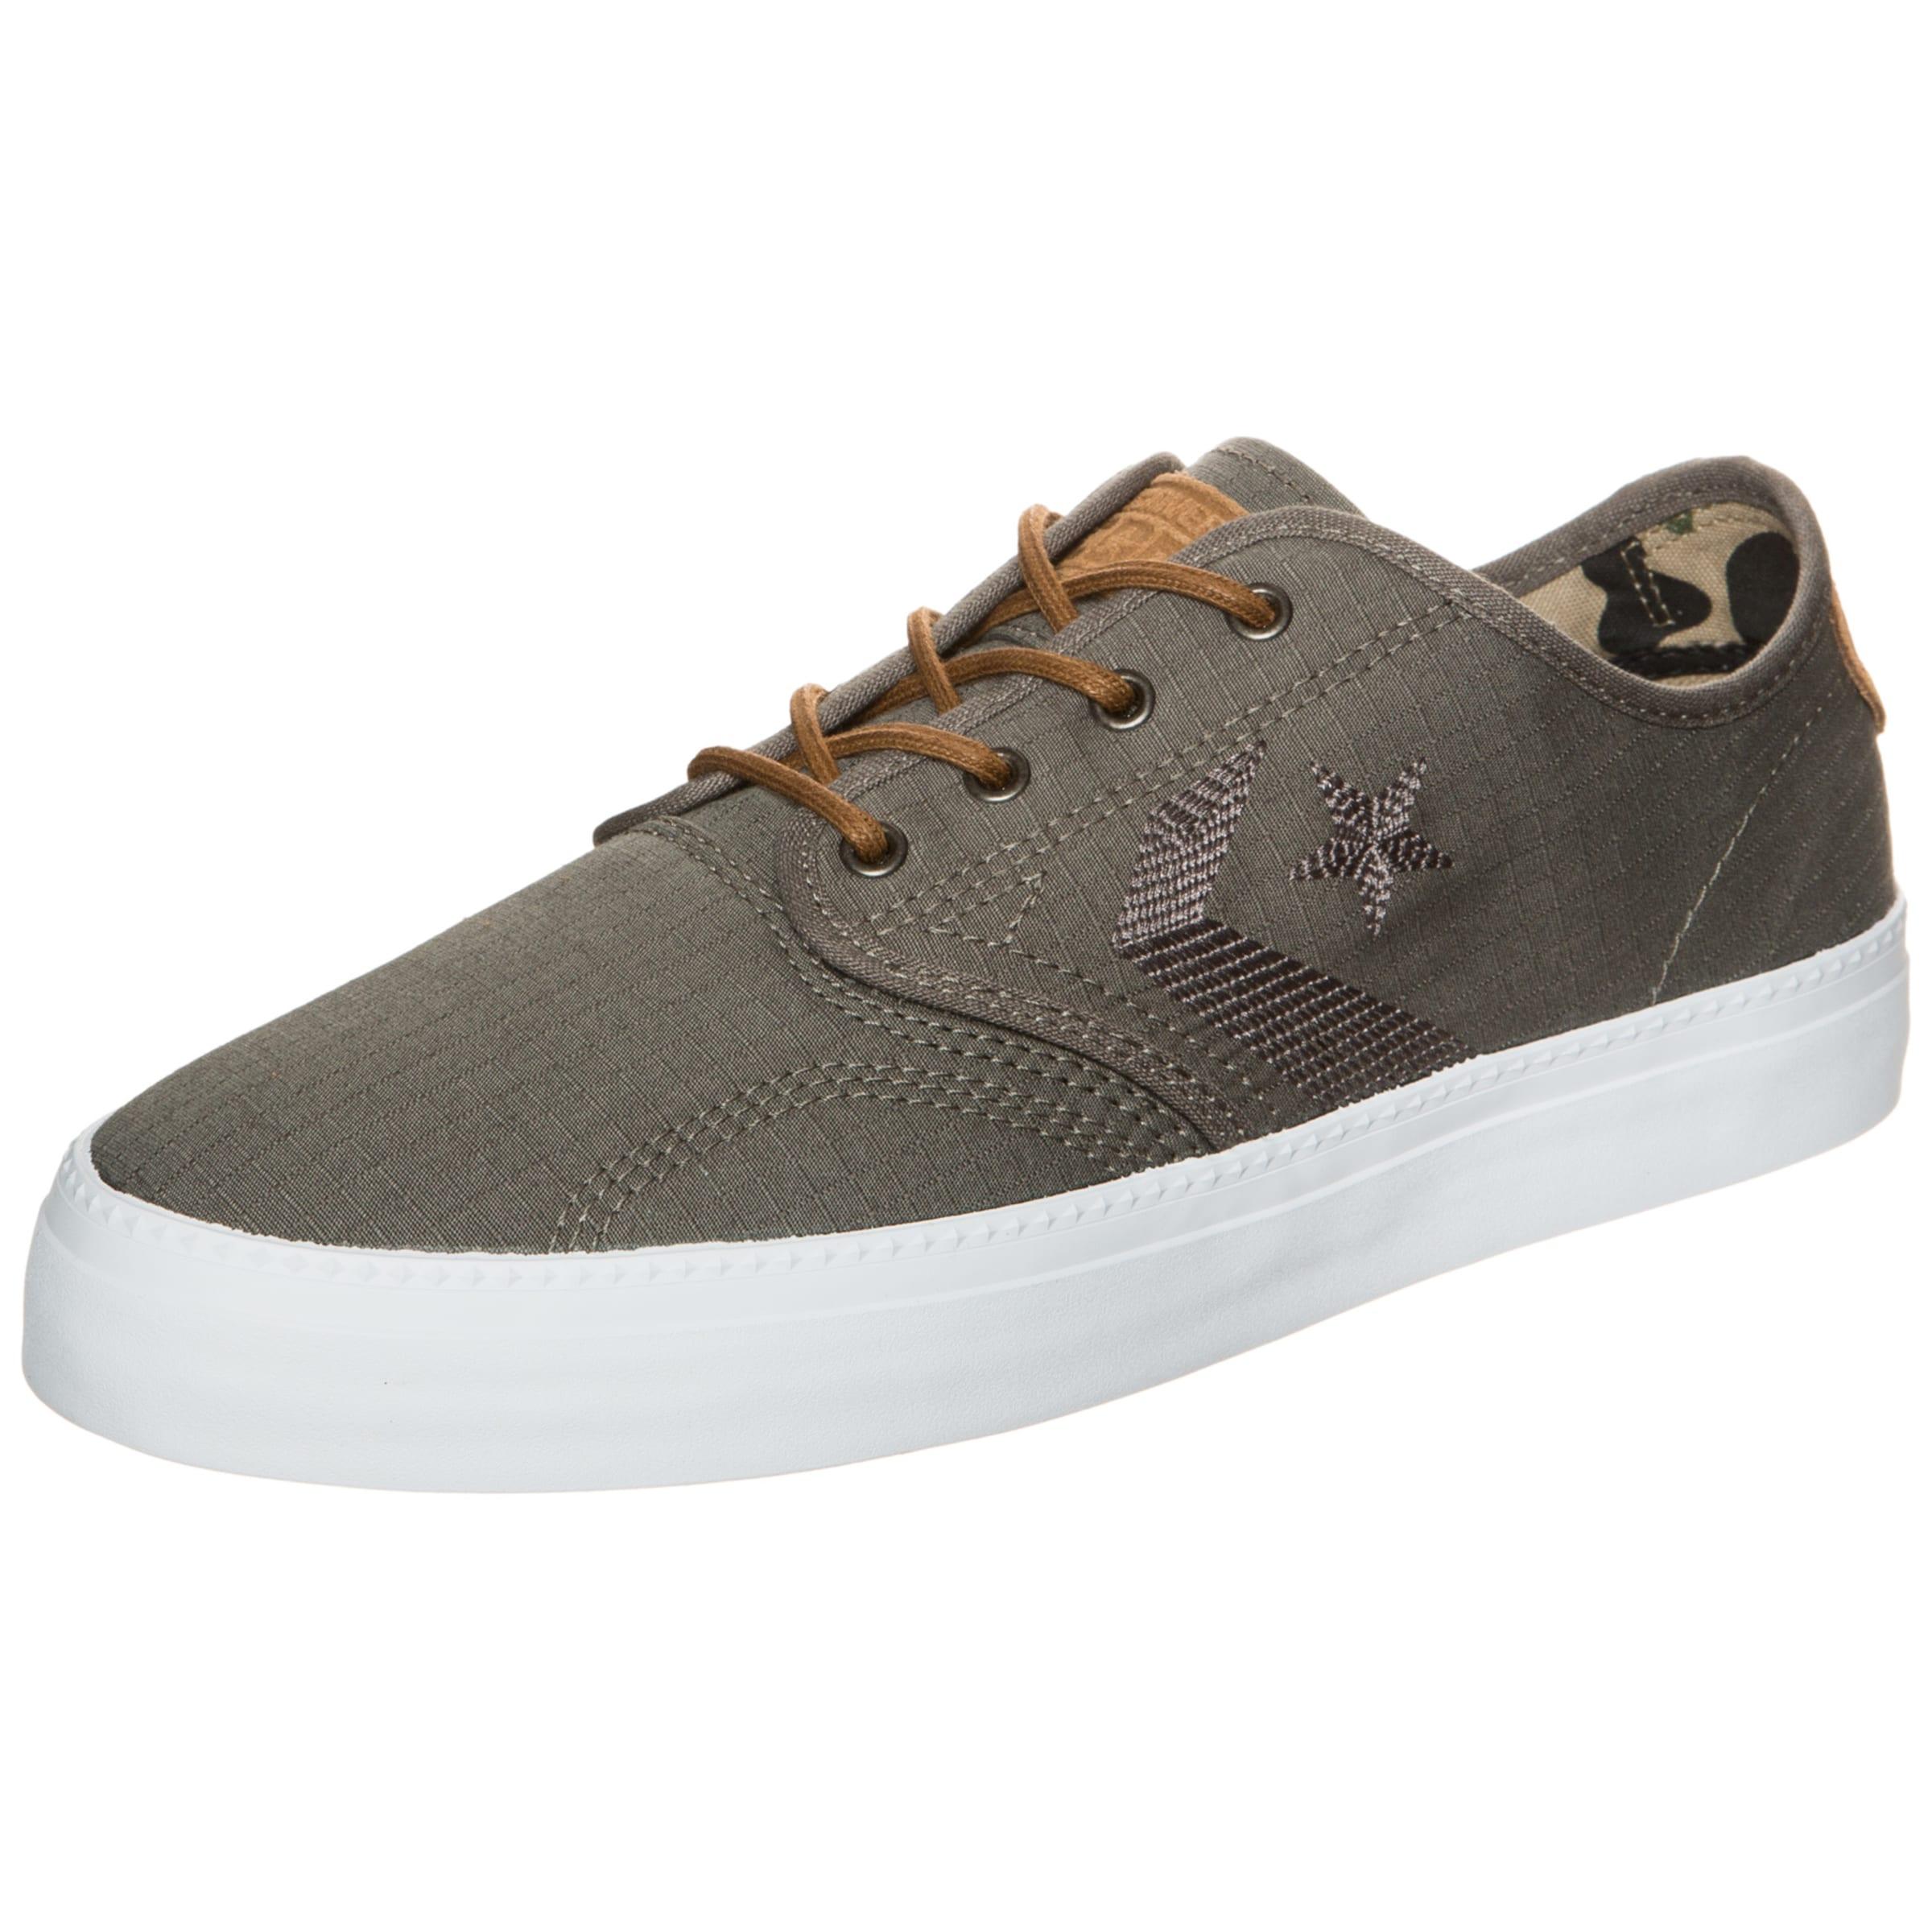 Zakim OX OX Cons CONVERSE Cons Sneaker CONVERSE Sneaker Zakim CONVERSE Zq7Tv